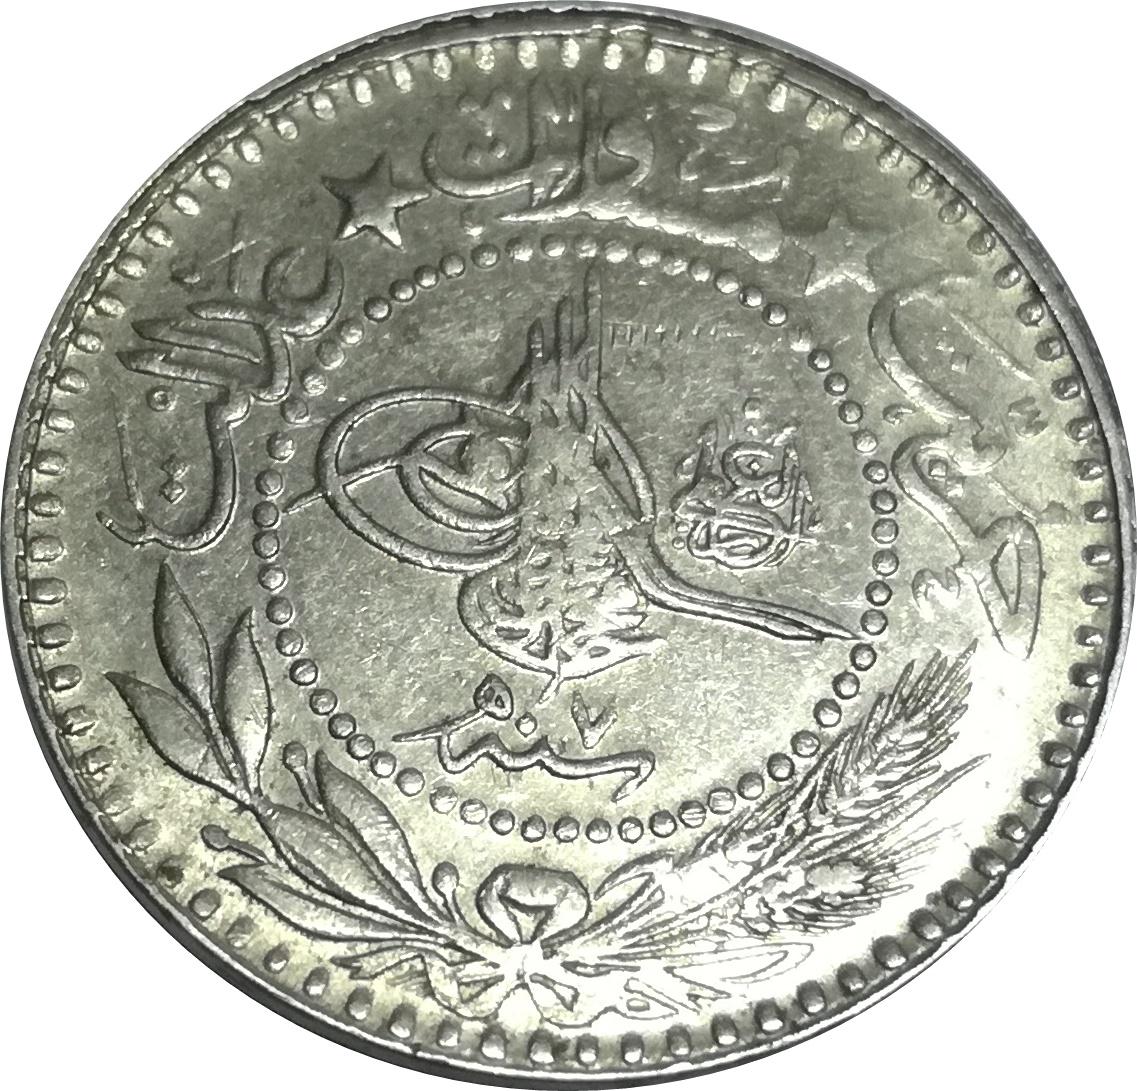 TURKEY OTTOMAN EMPIRE 5 para AH 1327 TURKISH COINS